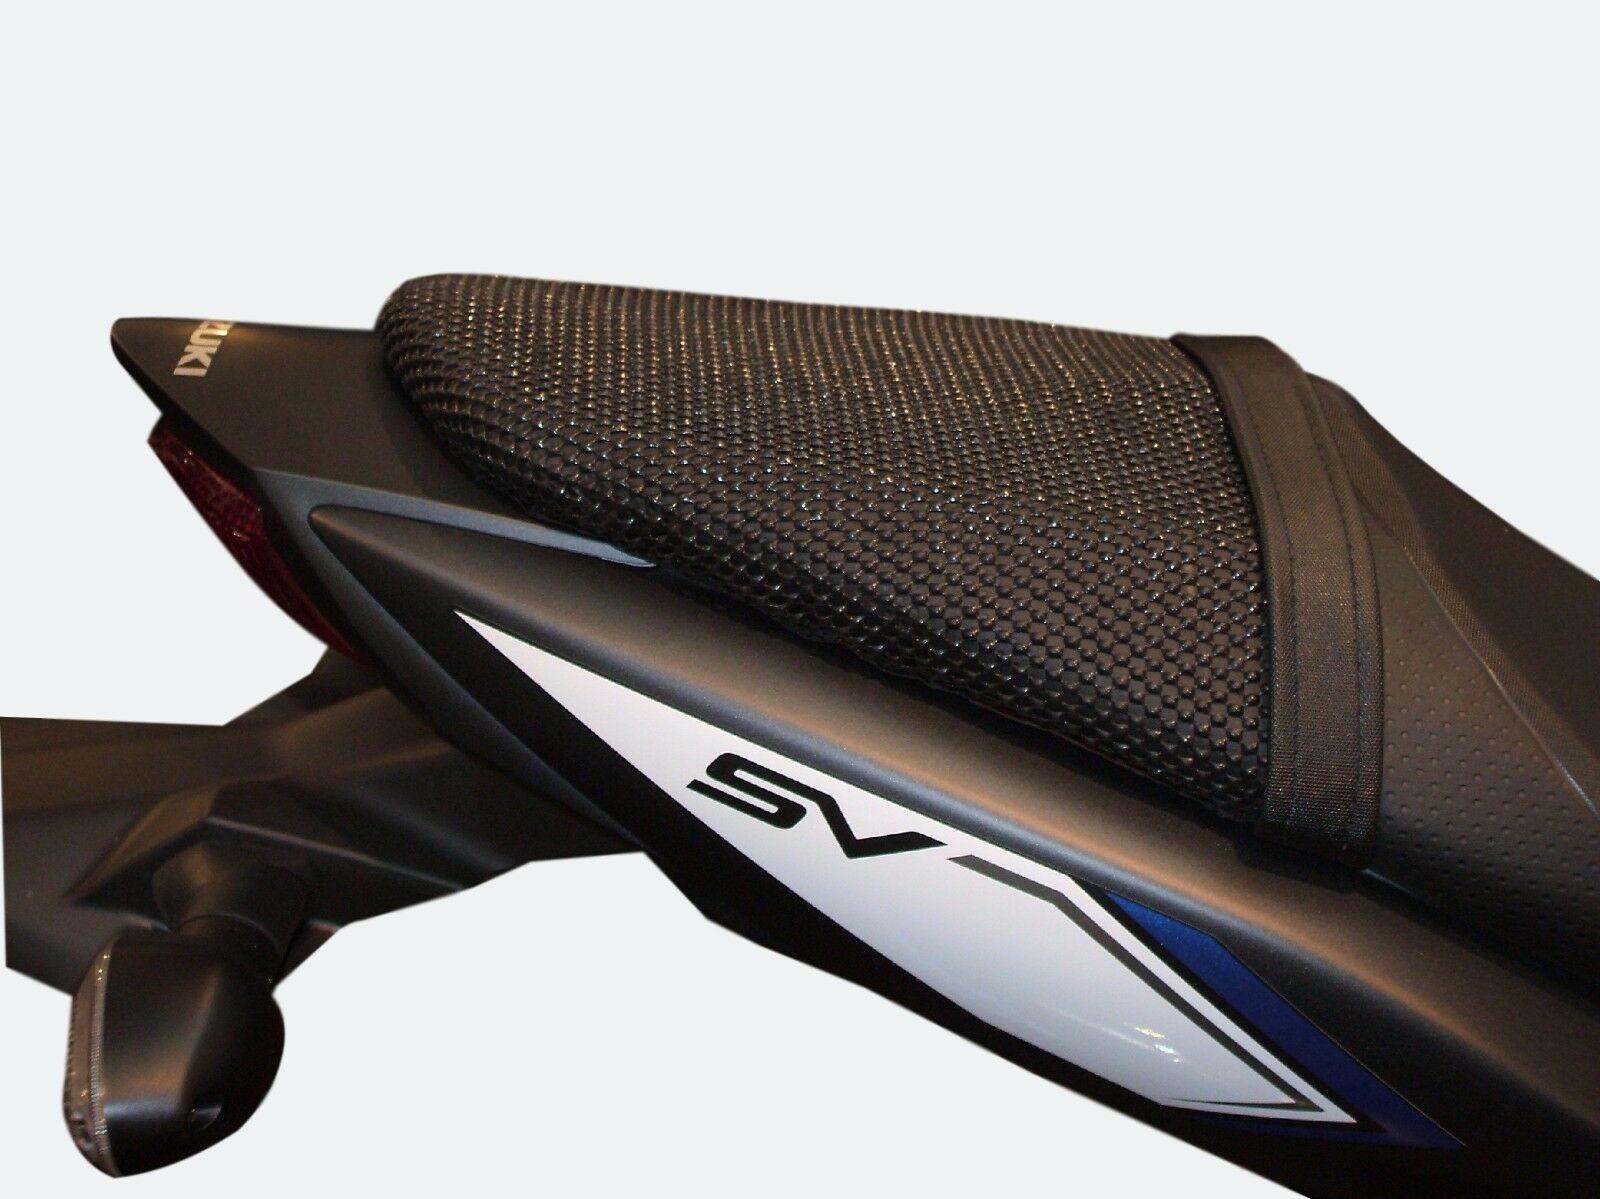 SUZUKI GSR 750 Z 2011-2016 TRIBOSEAT ANTI-SLIP PASSENGER SEAT COVER ACCESSORY